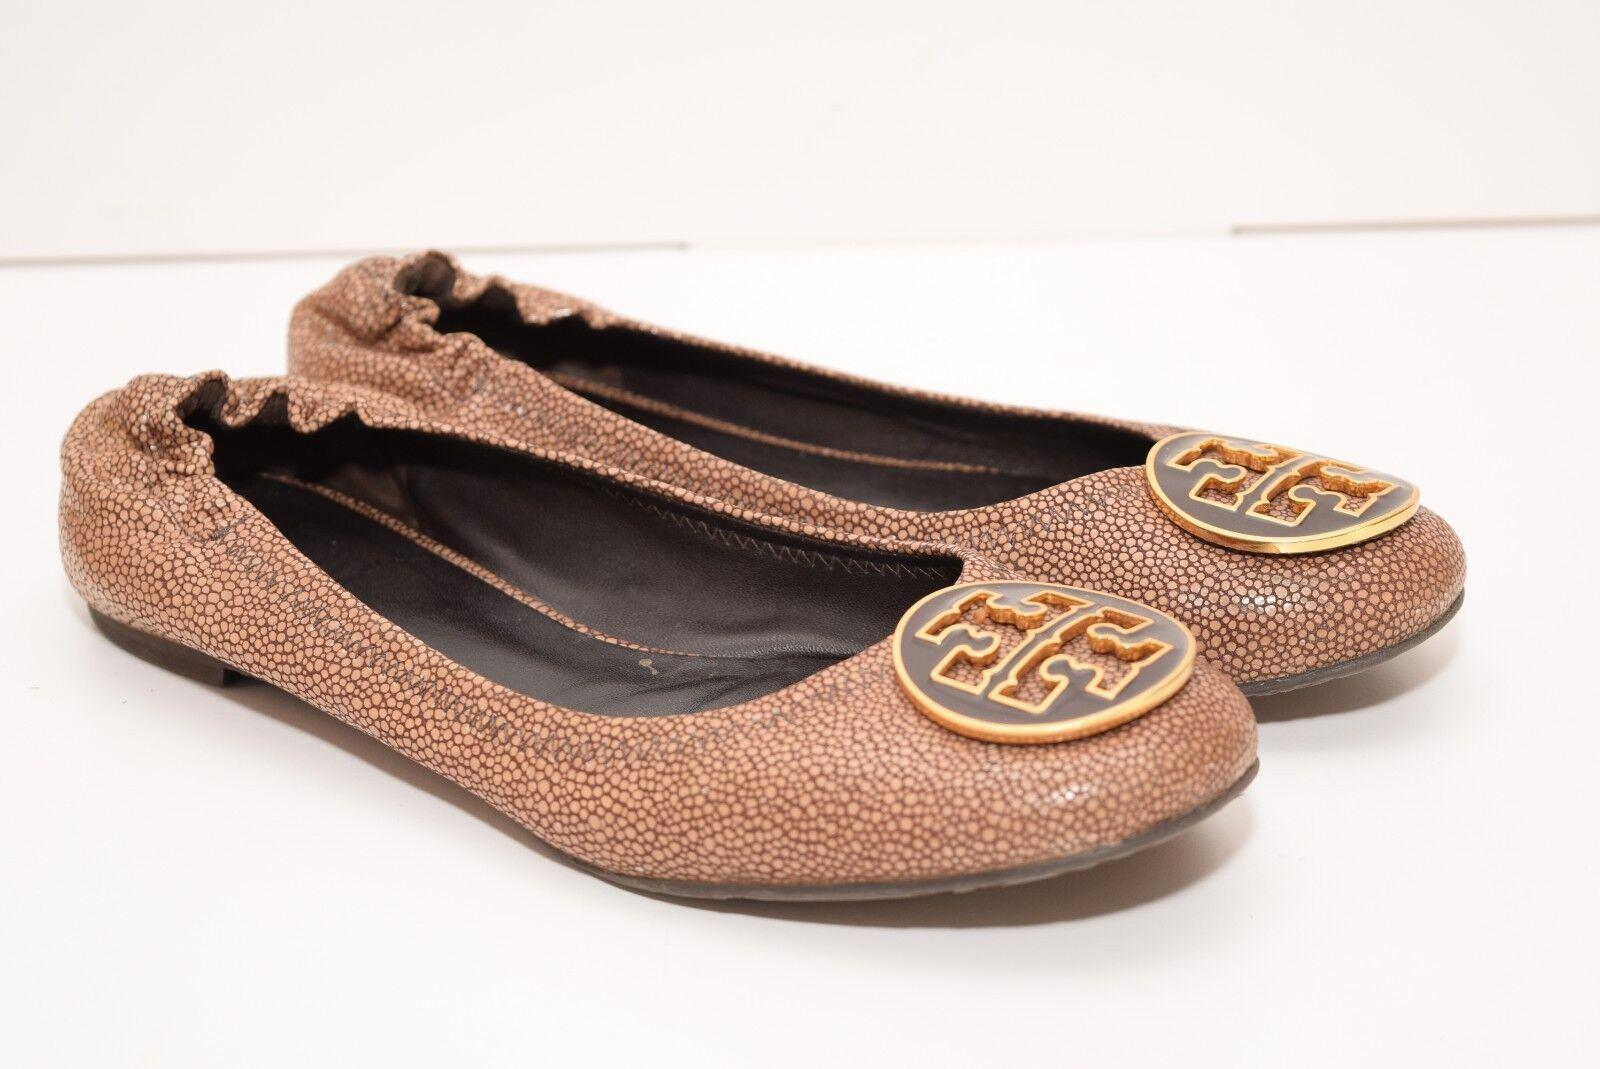 TORY BURCH Damenschuhe REVA Braun Beige Soft Leder Flat Schuhes sz 8M